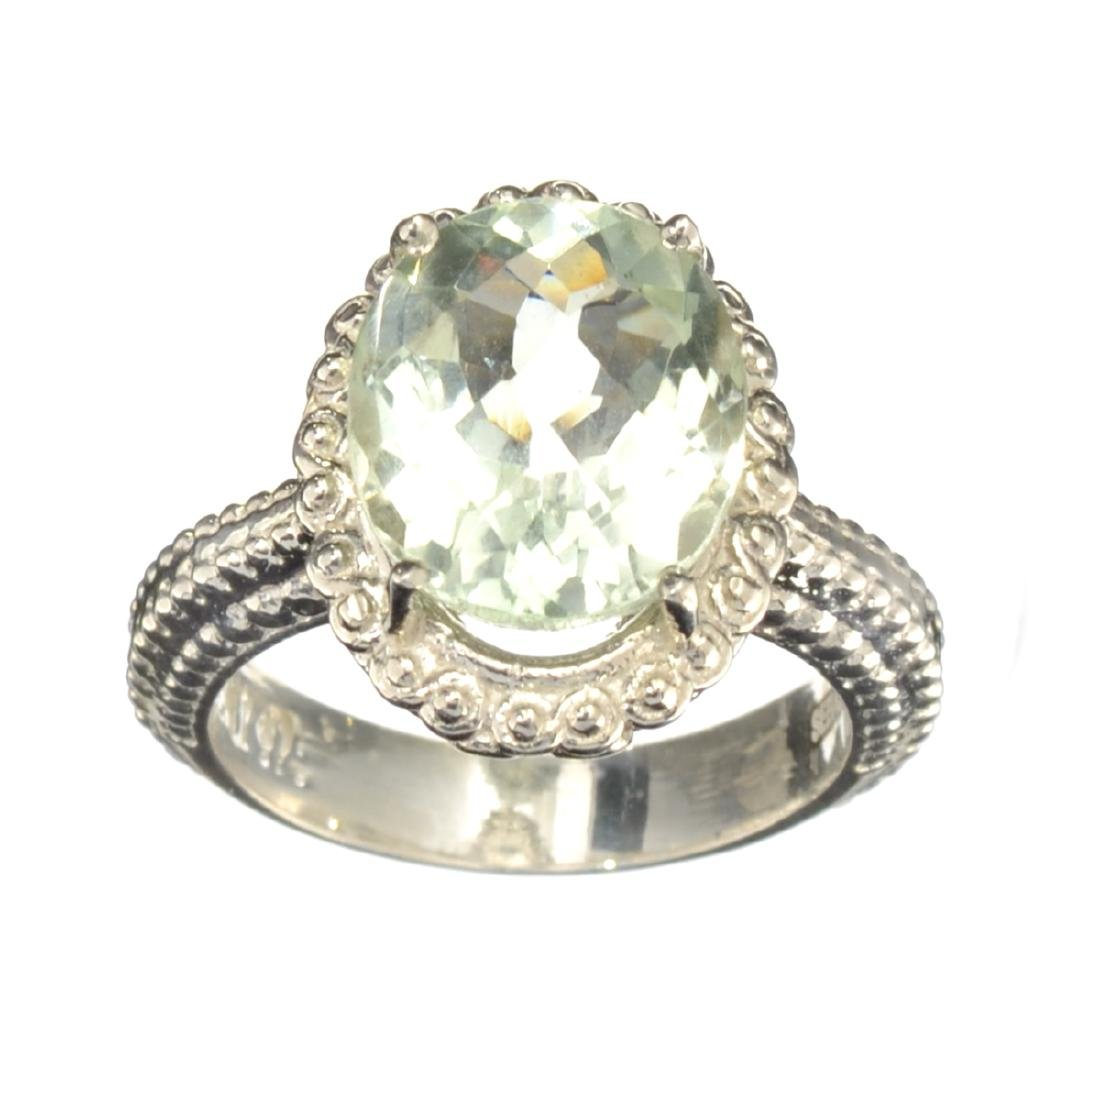 APP: 0.6k Fine Jewelry Designer Sebastian, 3.82CT Oval